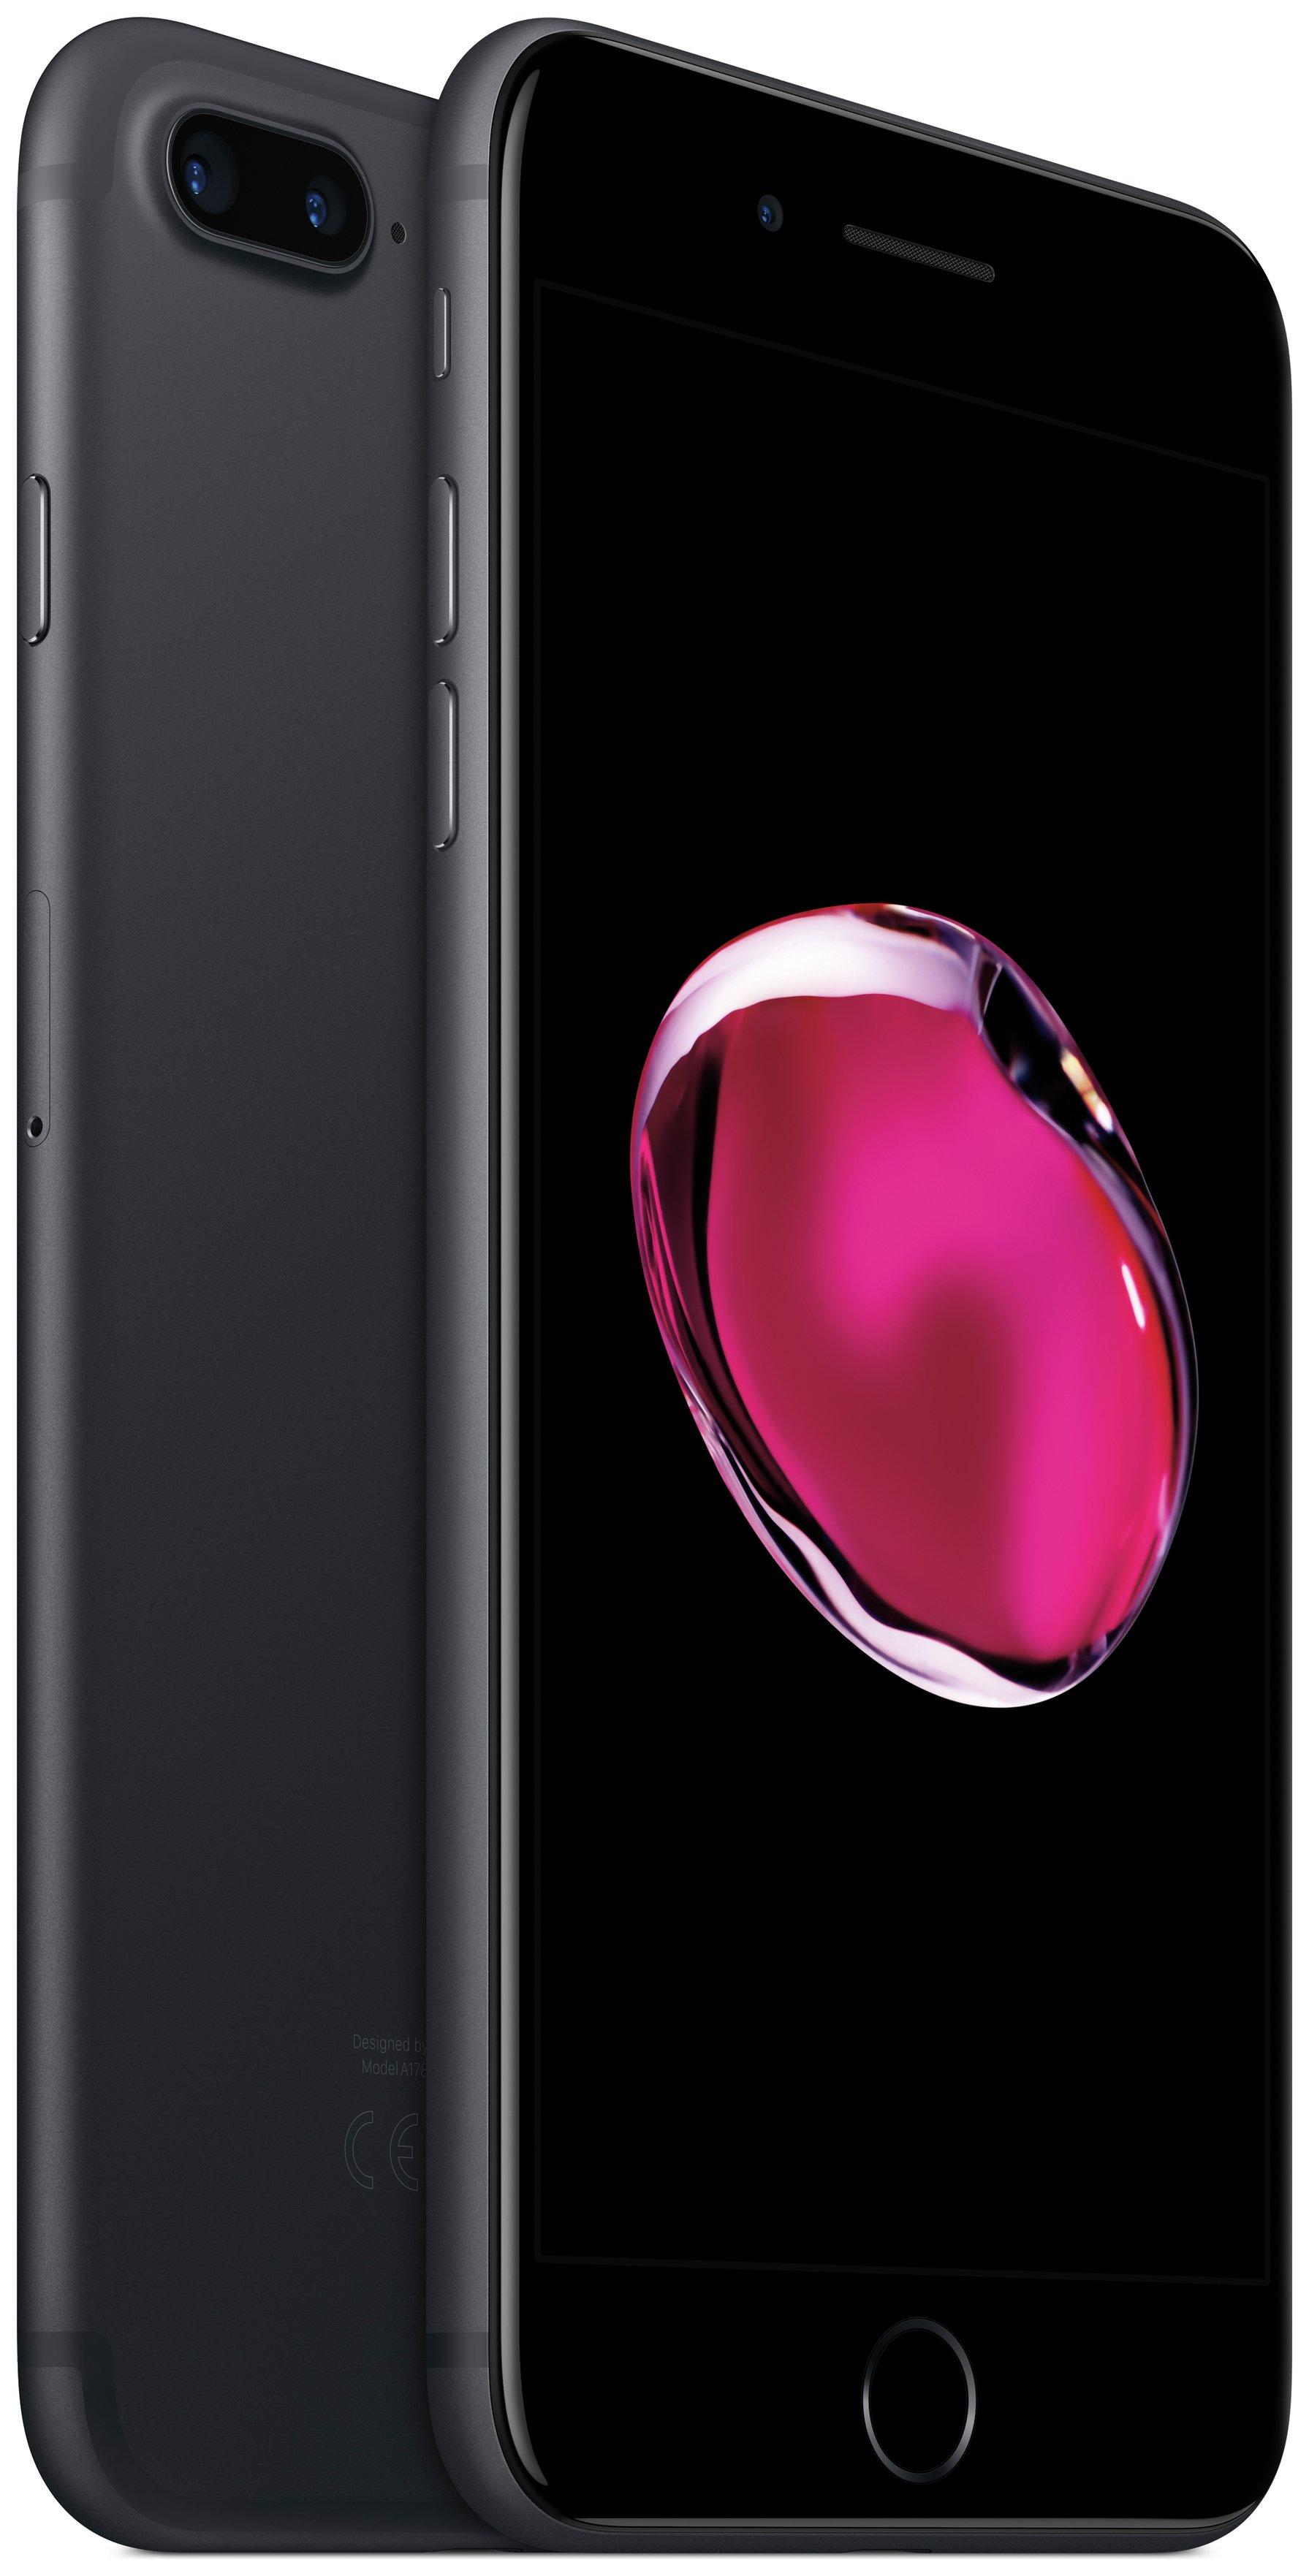 Apple Sim Free iPhone 7 Plus 256GB Mobile Phone - Black.